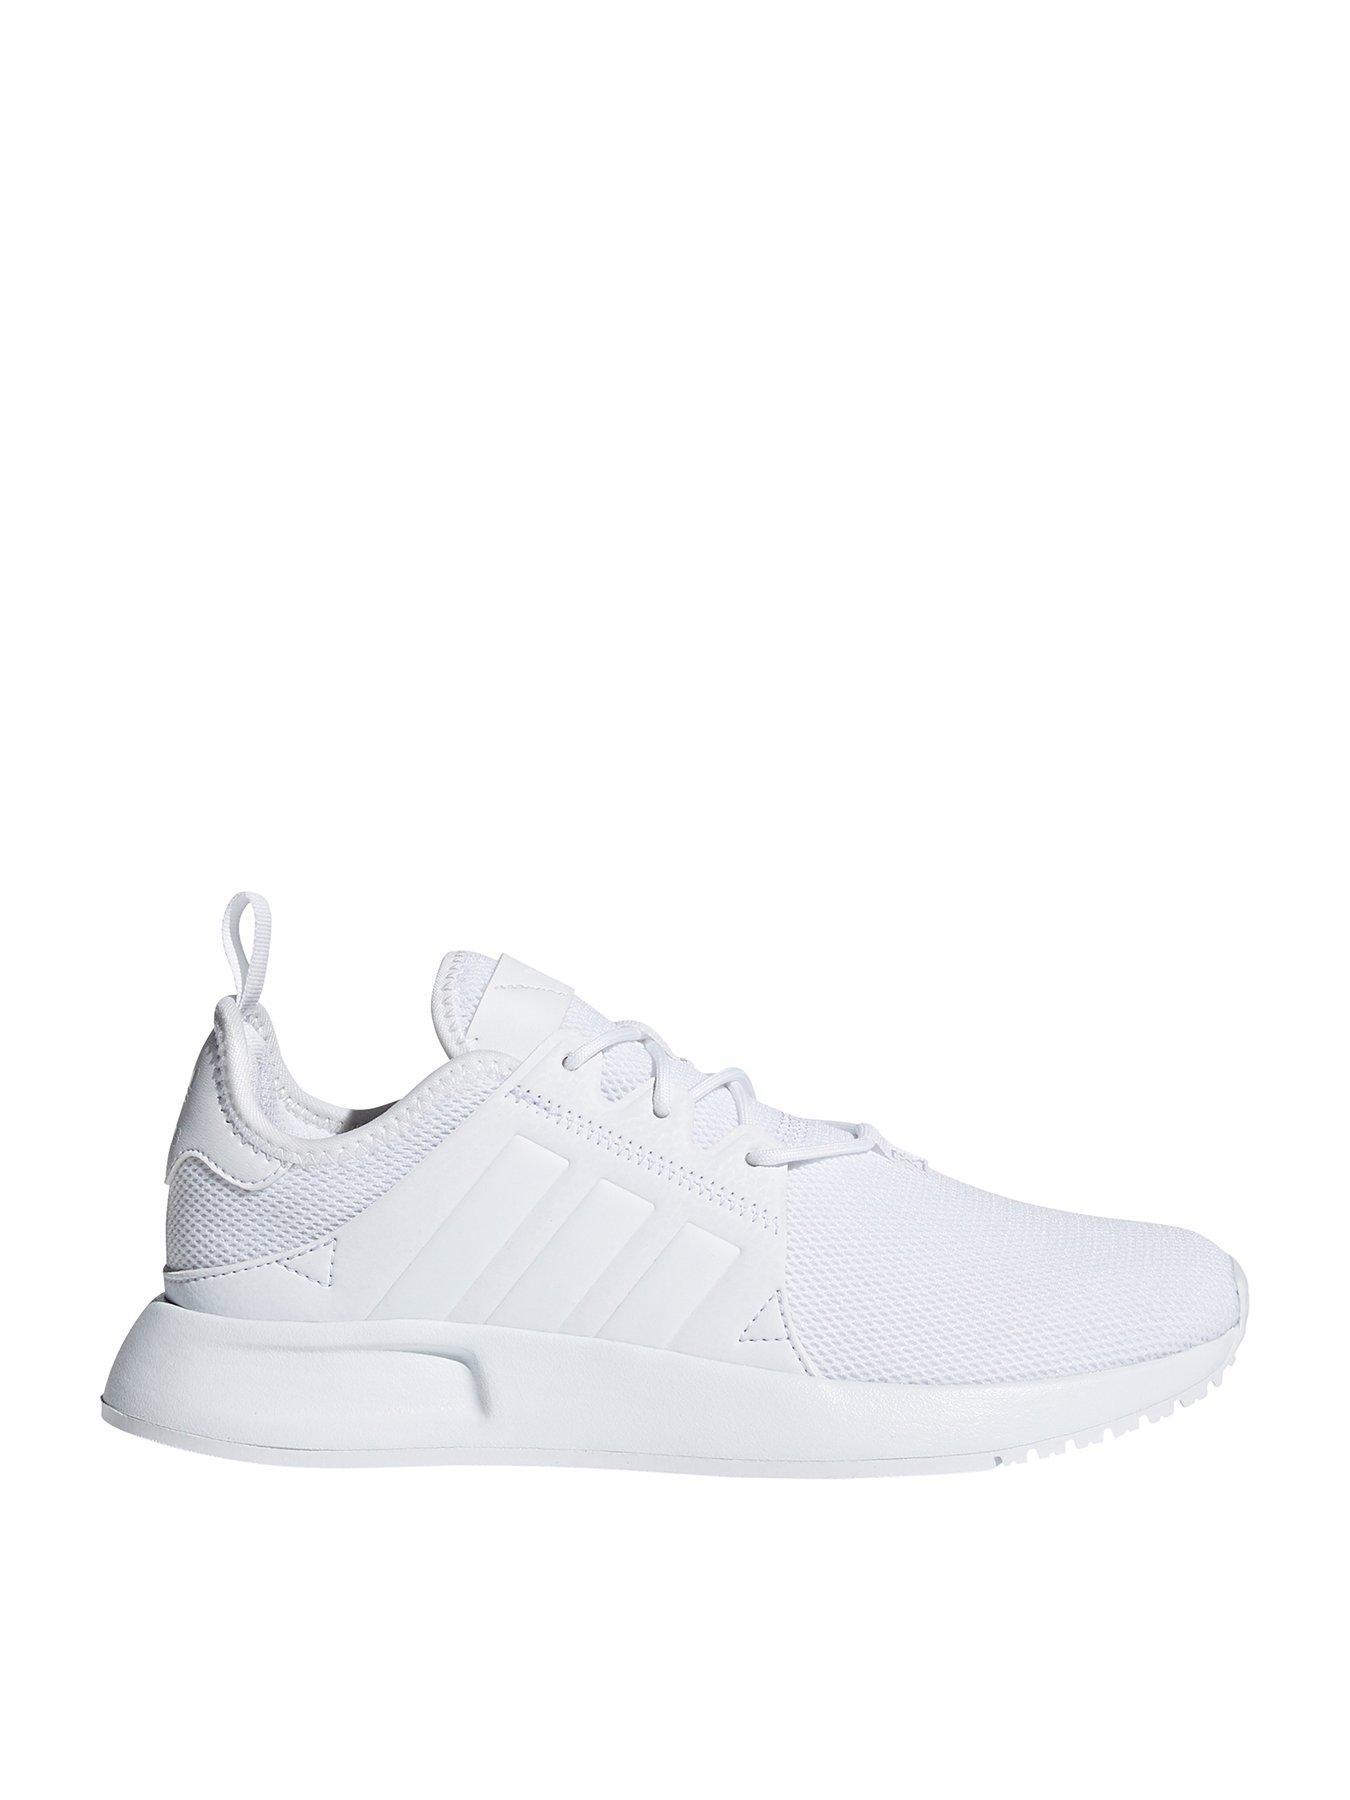 white adidas trainers junior off 74% - www.usushimd.com